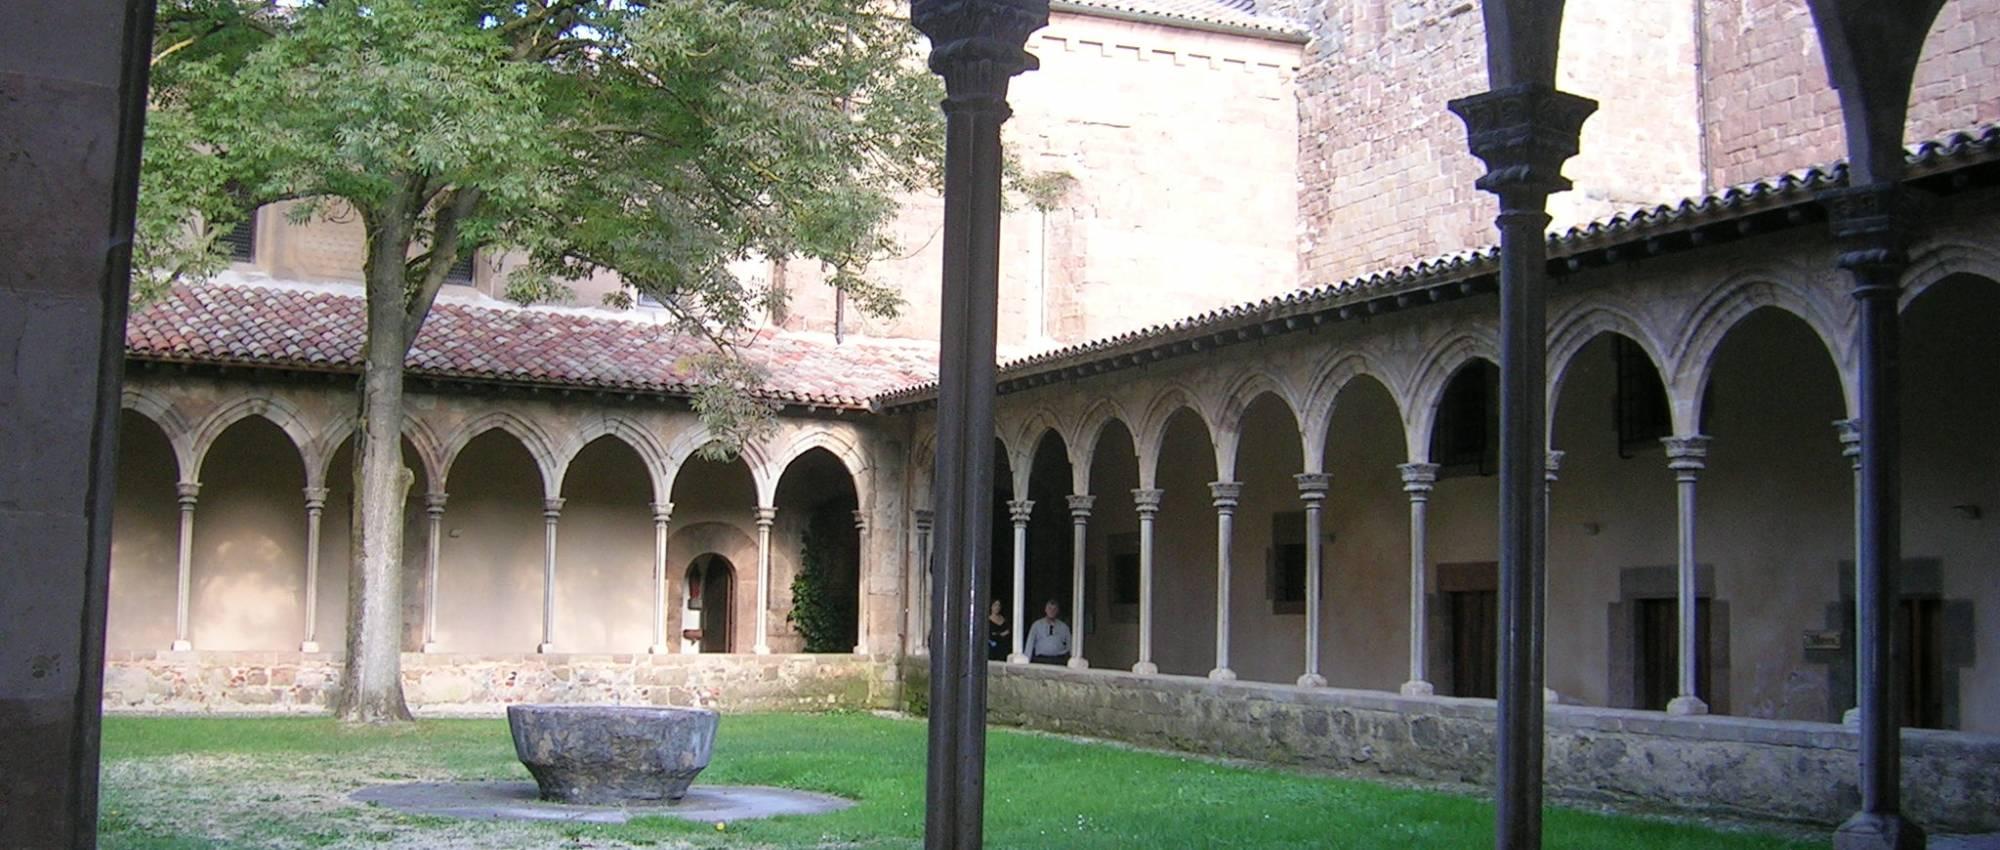 Claustro del monasterio de Sant Joan de les Abadesses. Xtv / Wikimedia Commons. Domini Púbic